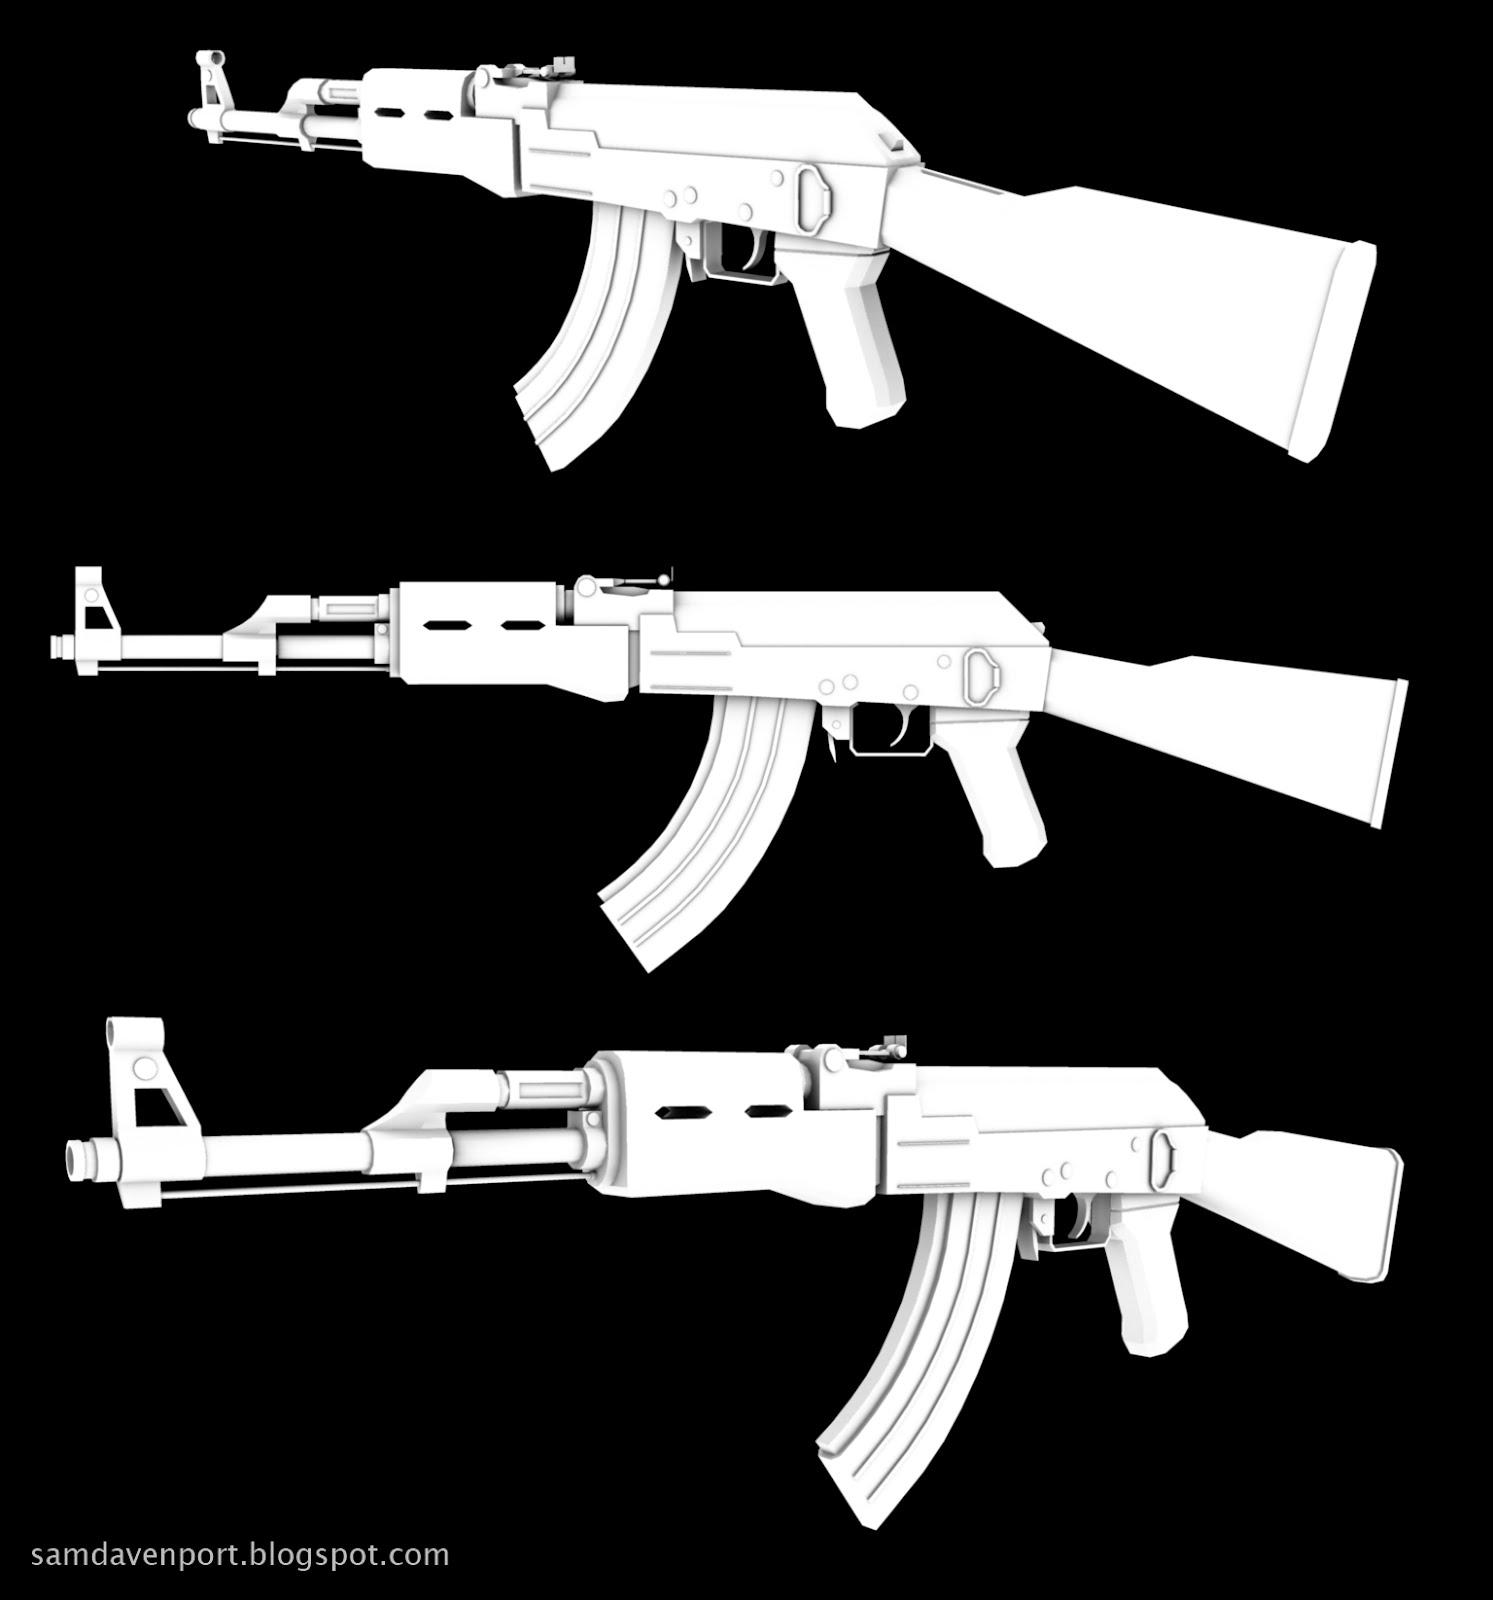 AK-47 complete | 3D Pad